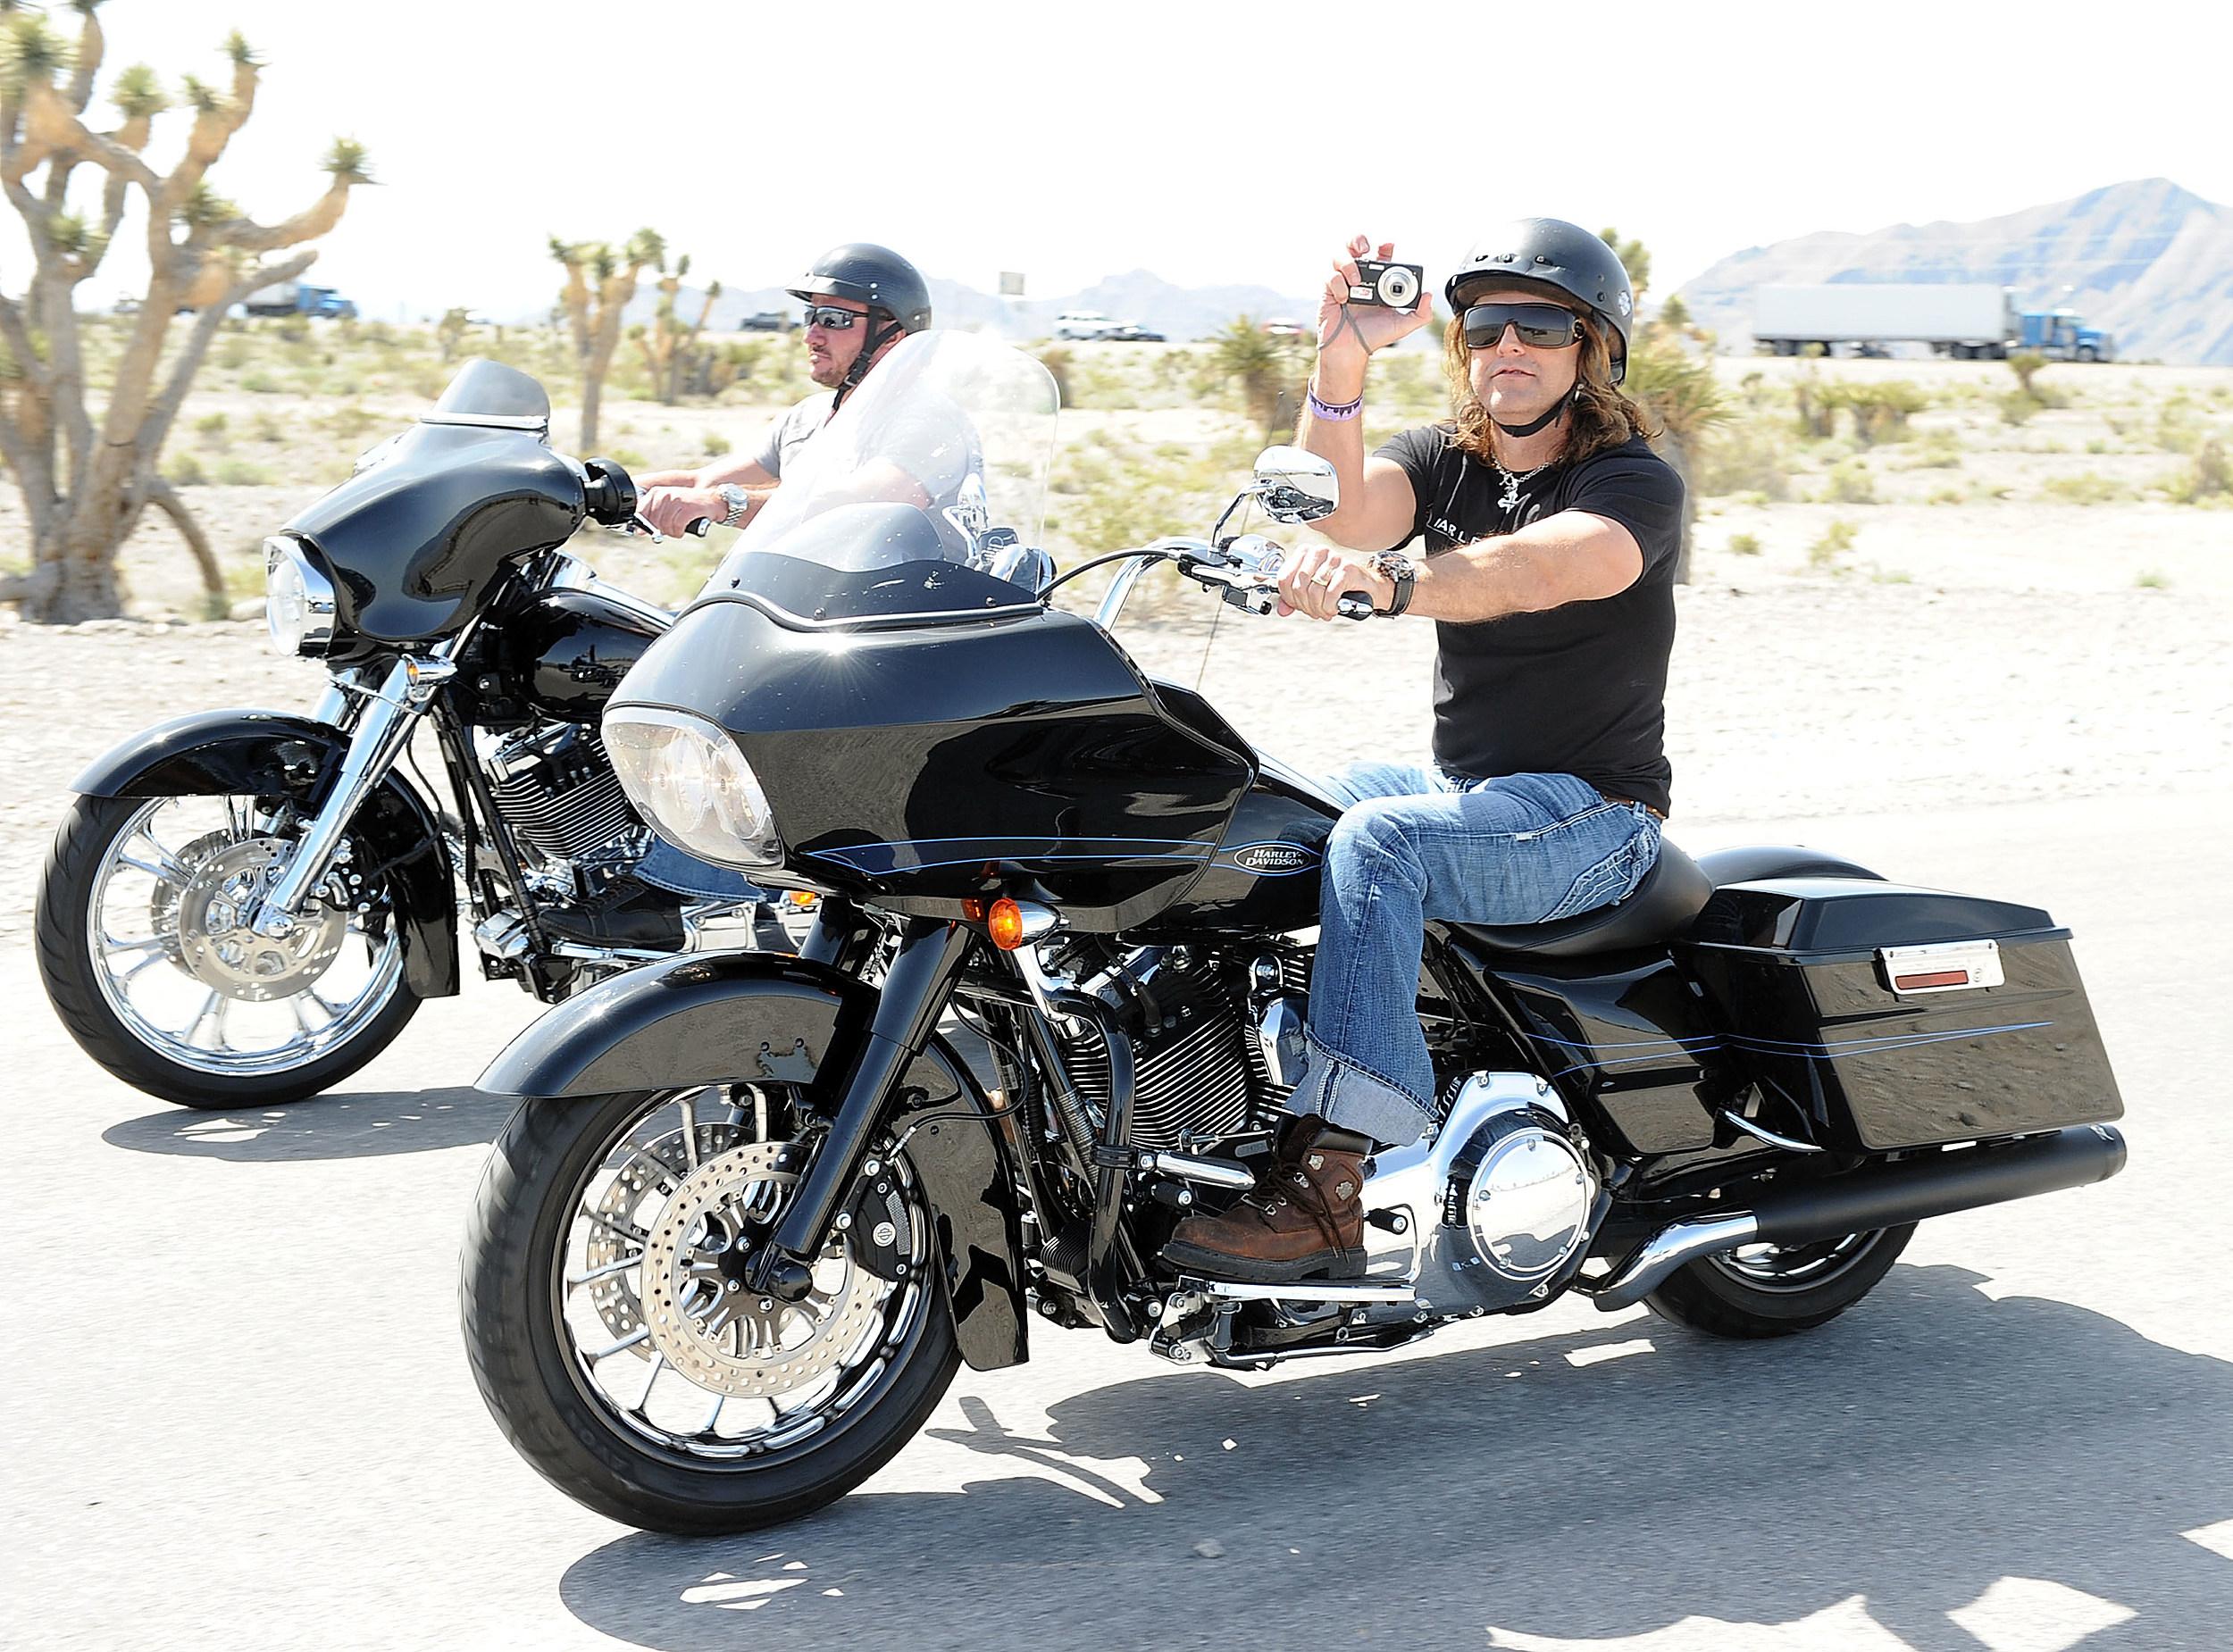 Rough Riders 11th annual turkey run to benefit veterans